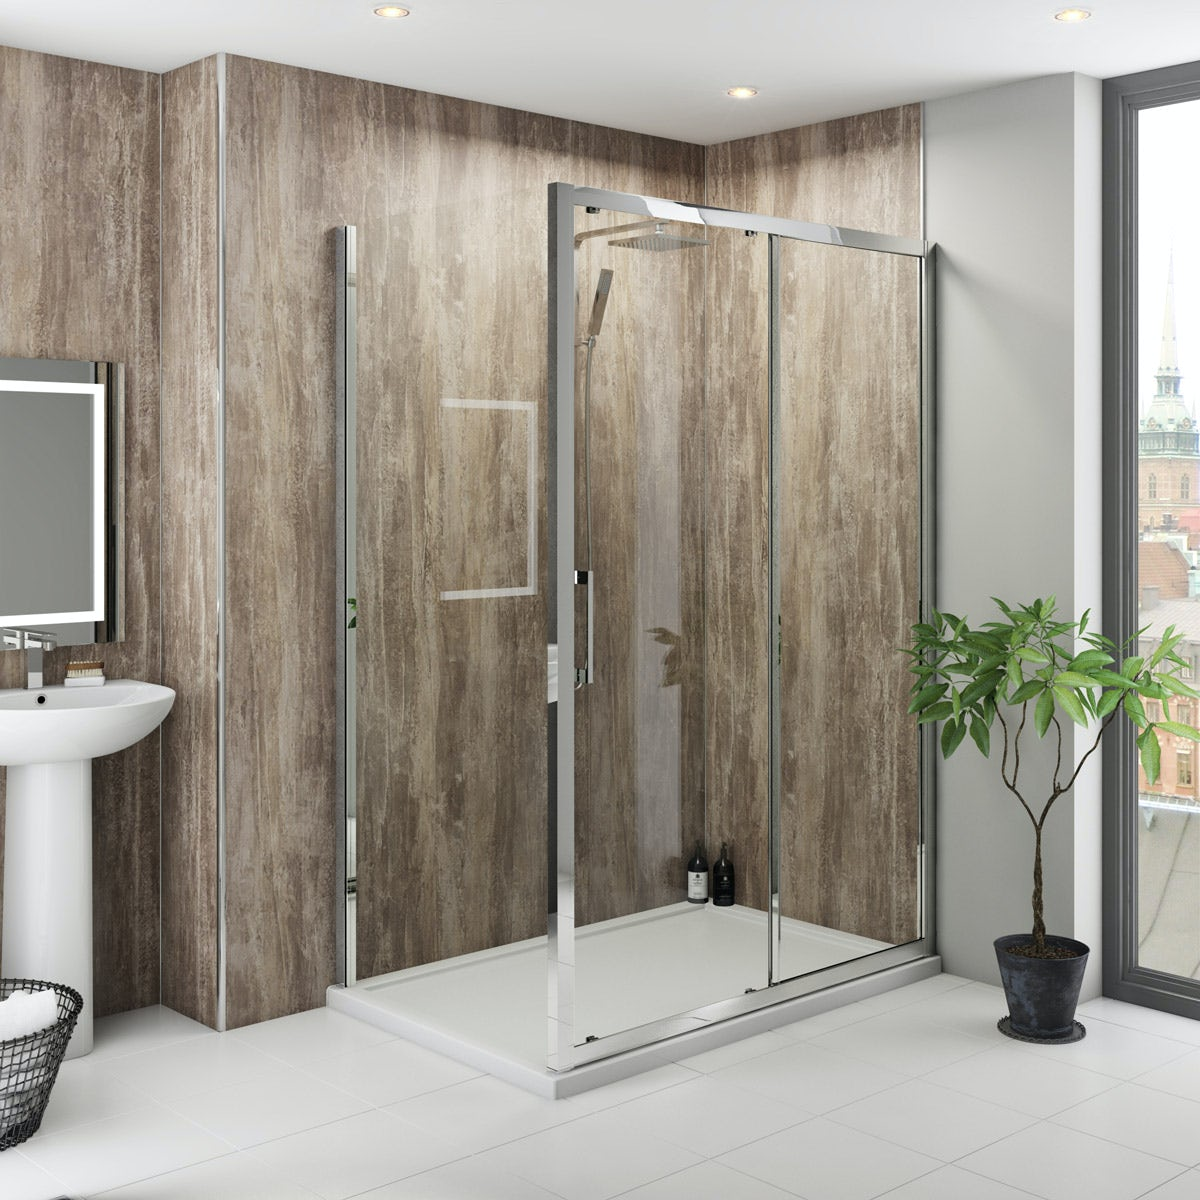 Merveilleux Multipanel Classic Monsoon Hydrolock Shower Wall Panel 598